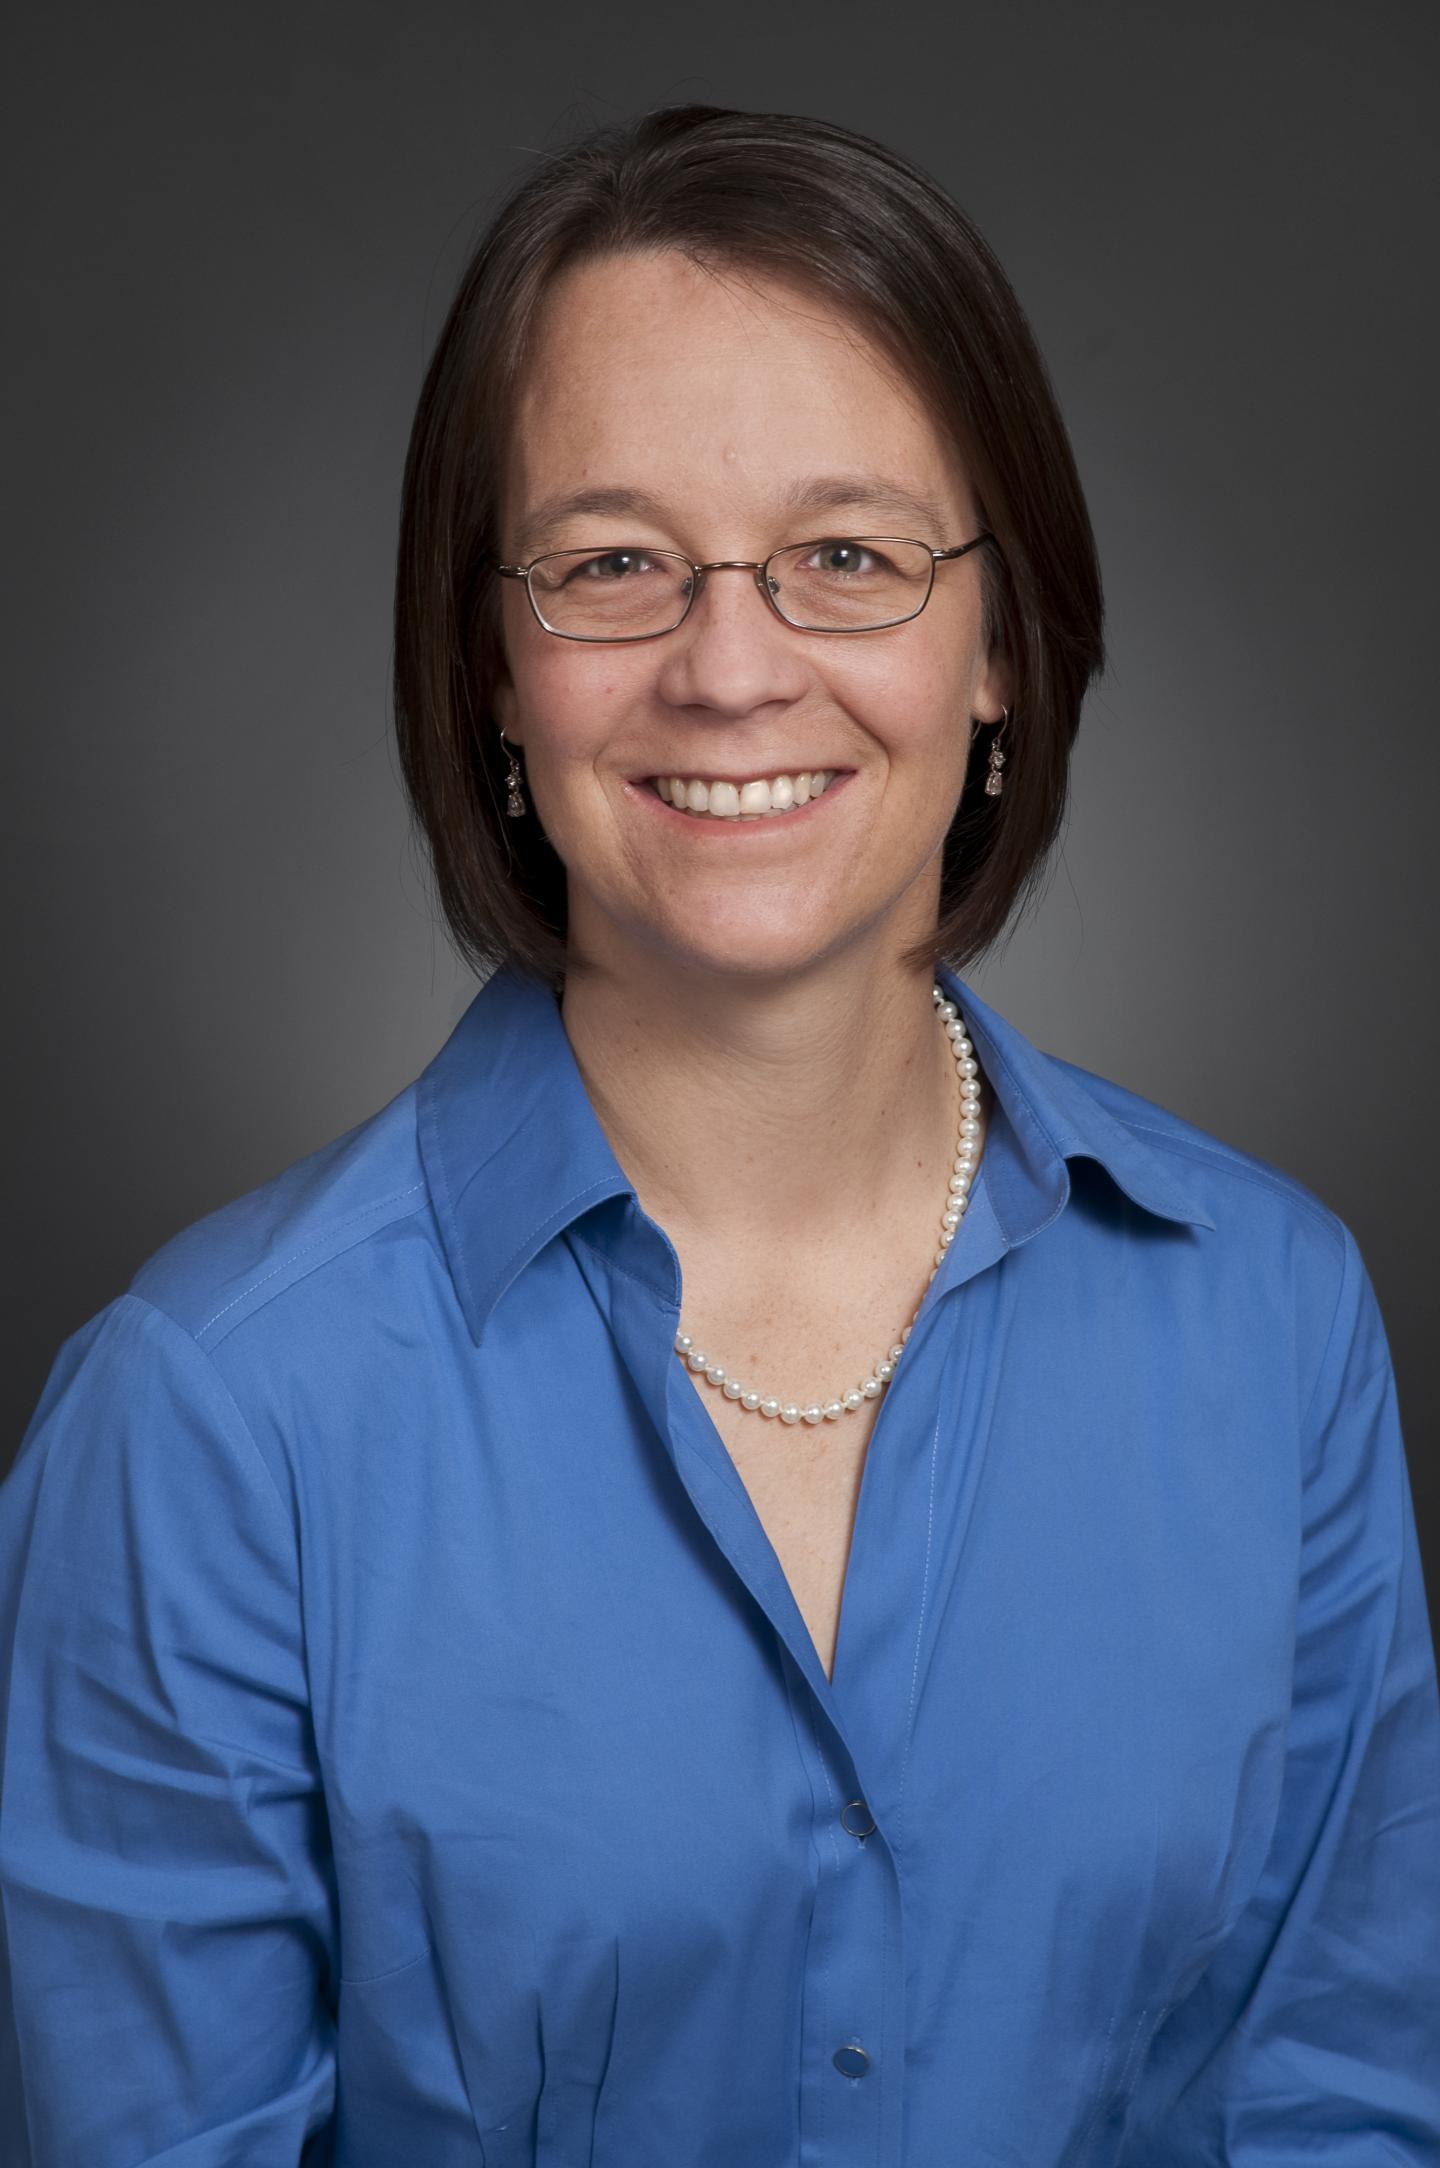 Ellen Rathje,  Seismological Society of America